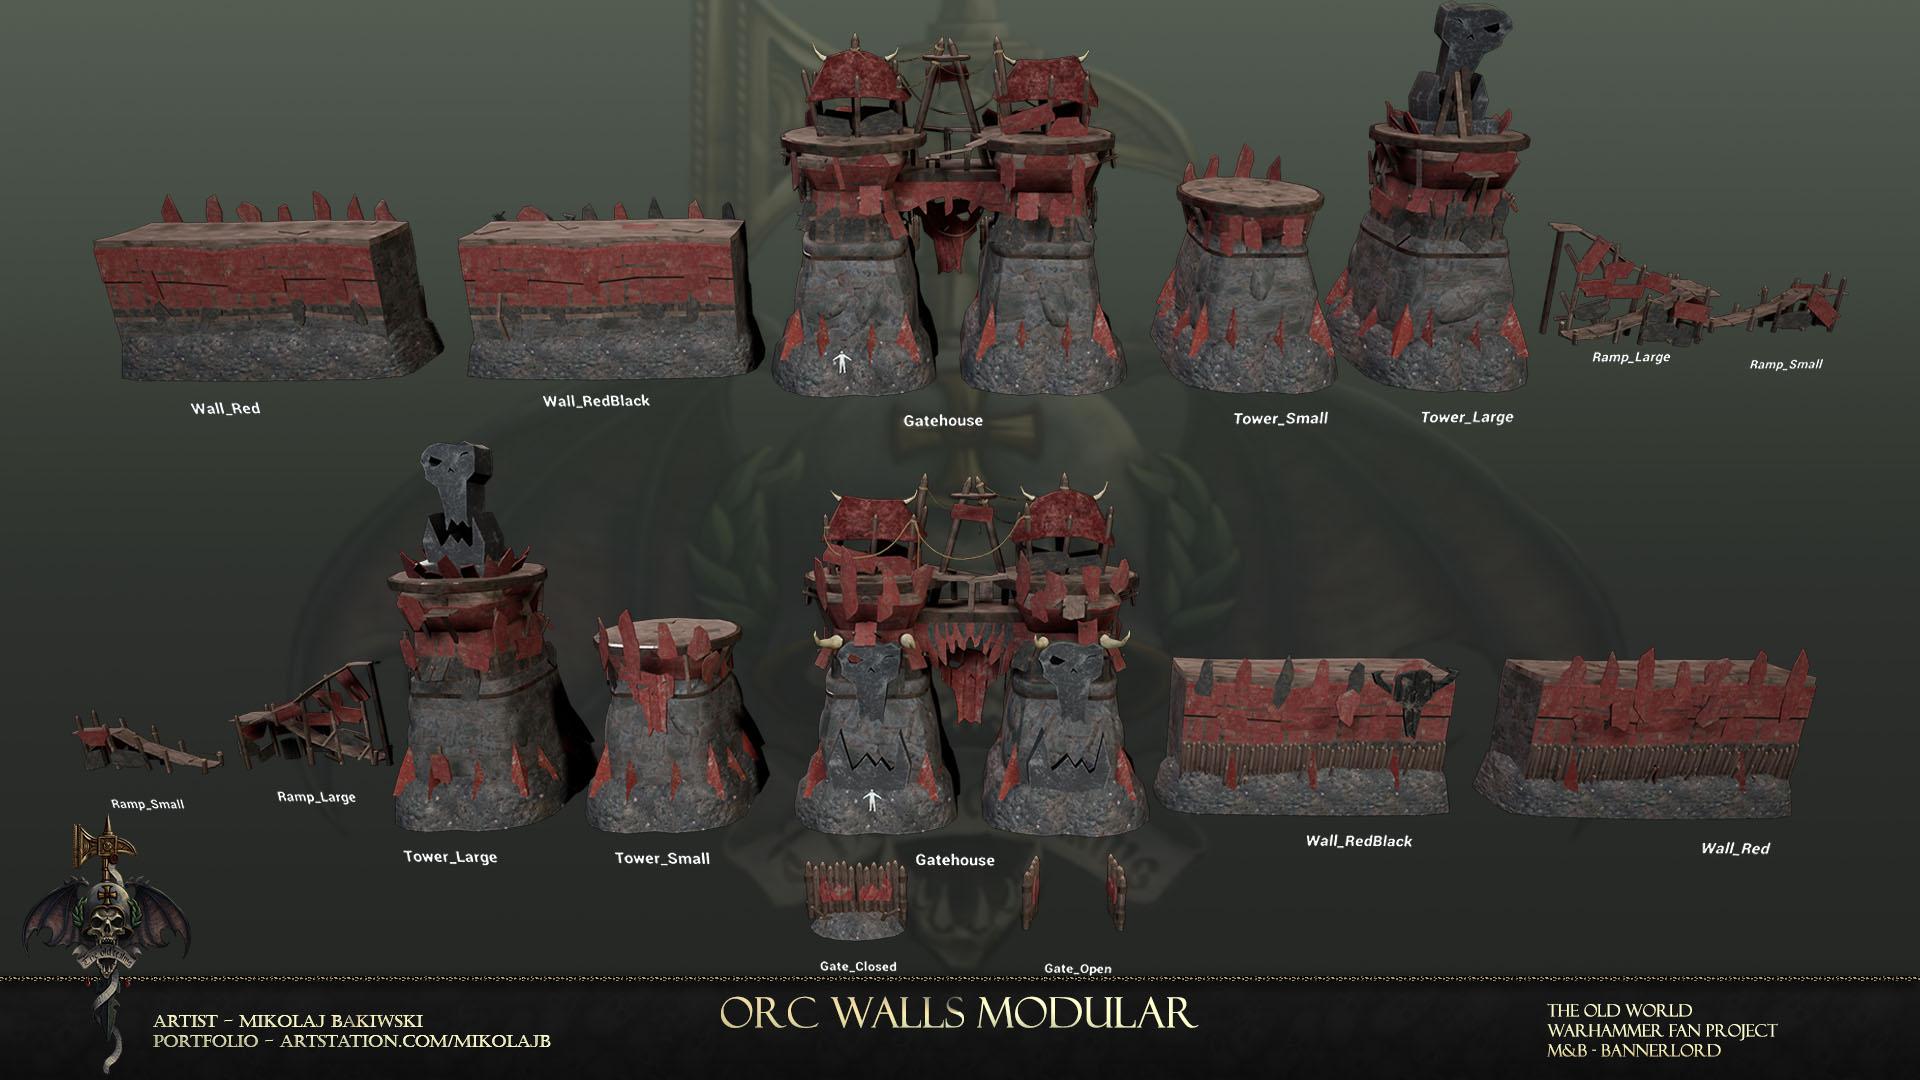 orc walls modulat